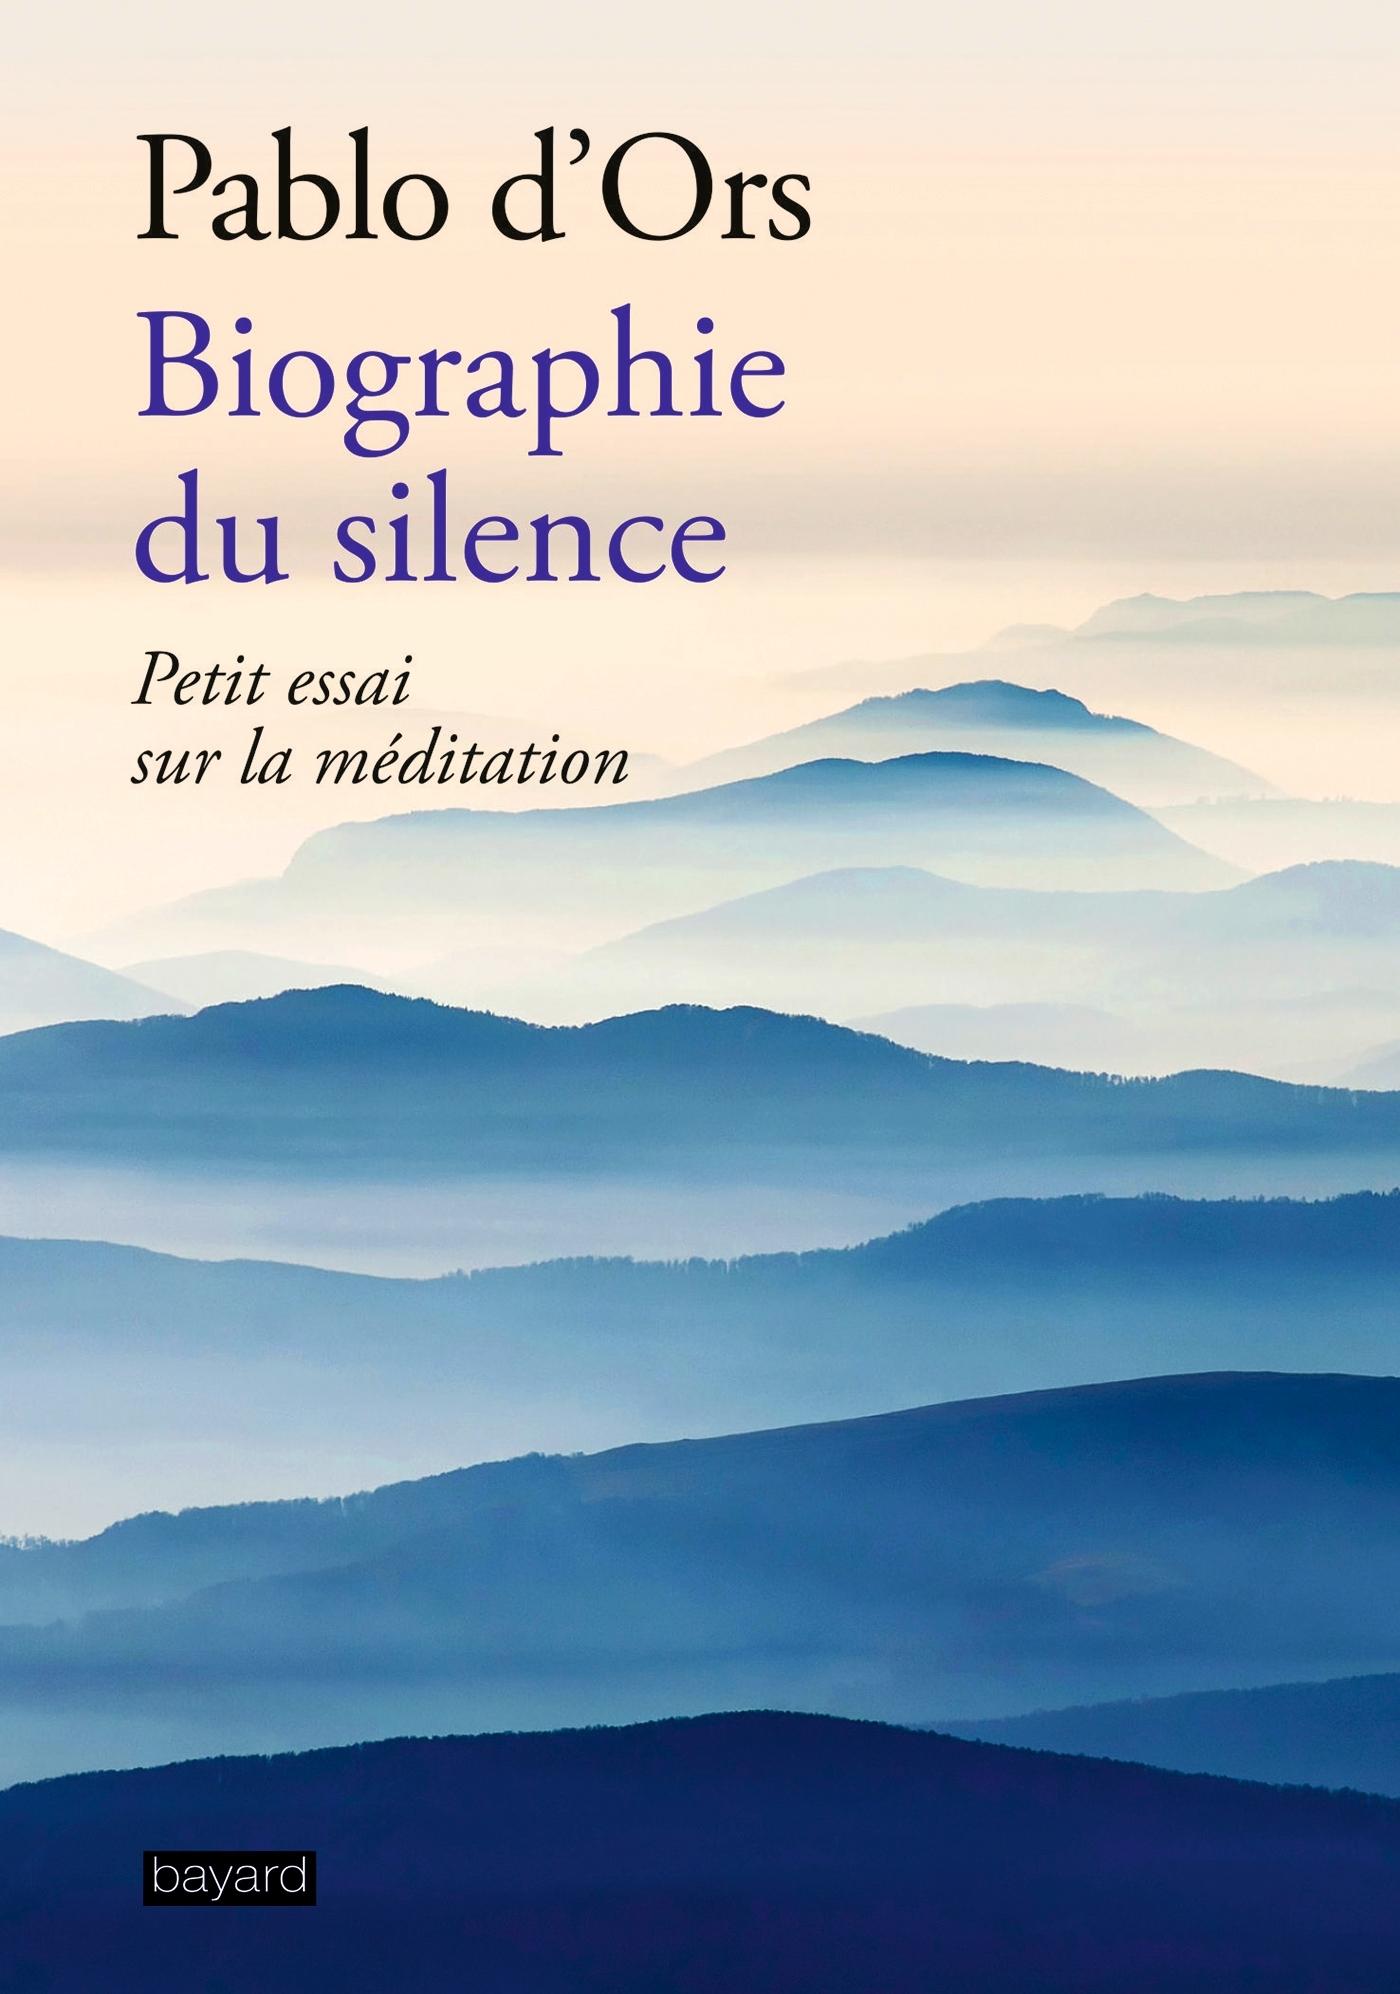 BIOGRAPHIE DU SILENCE